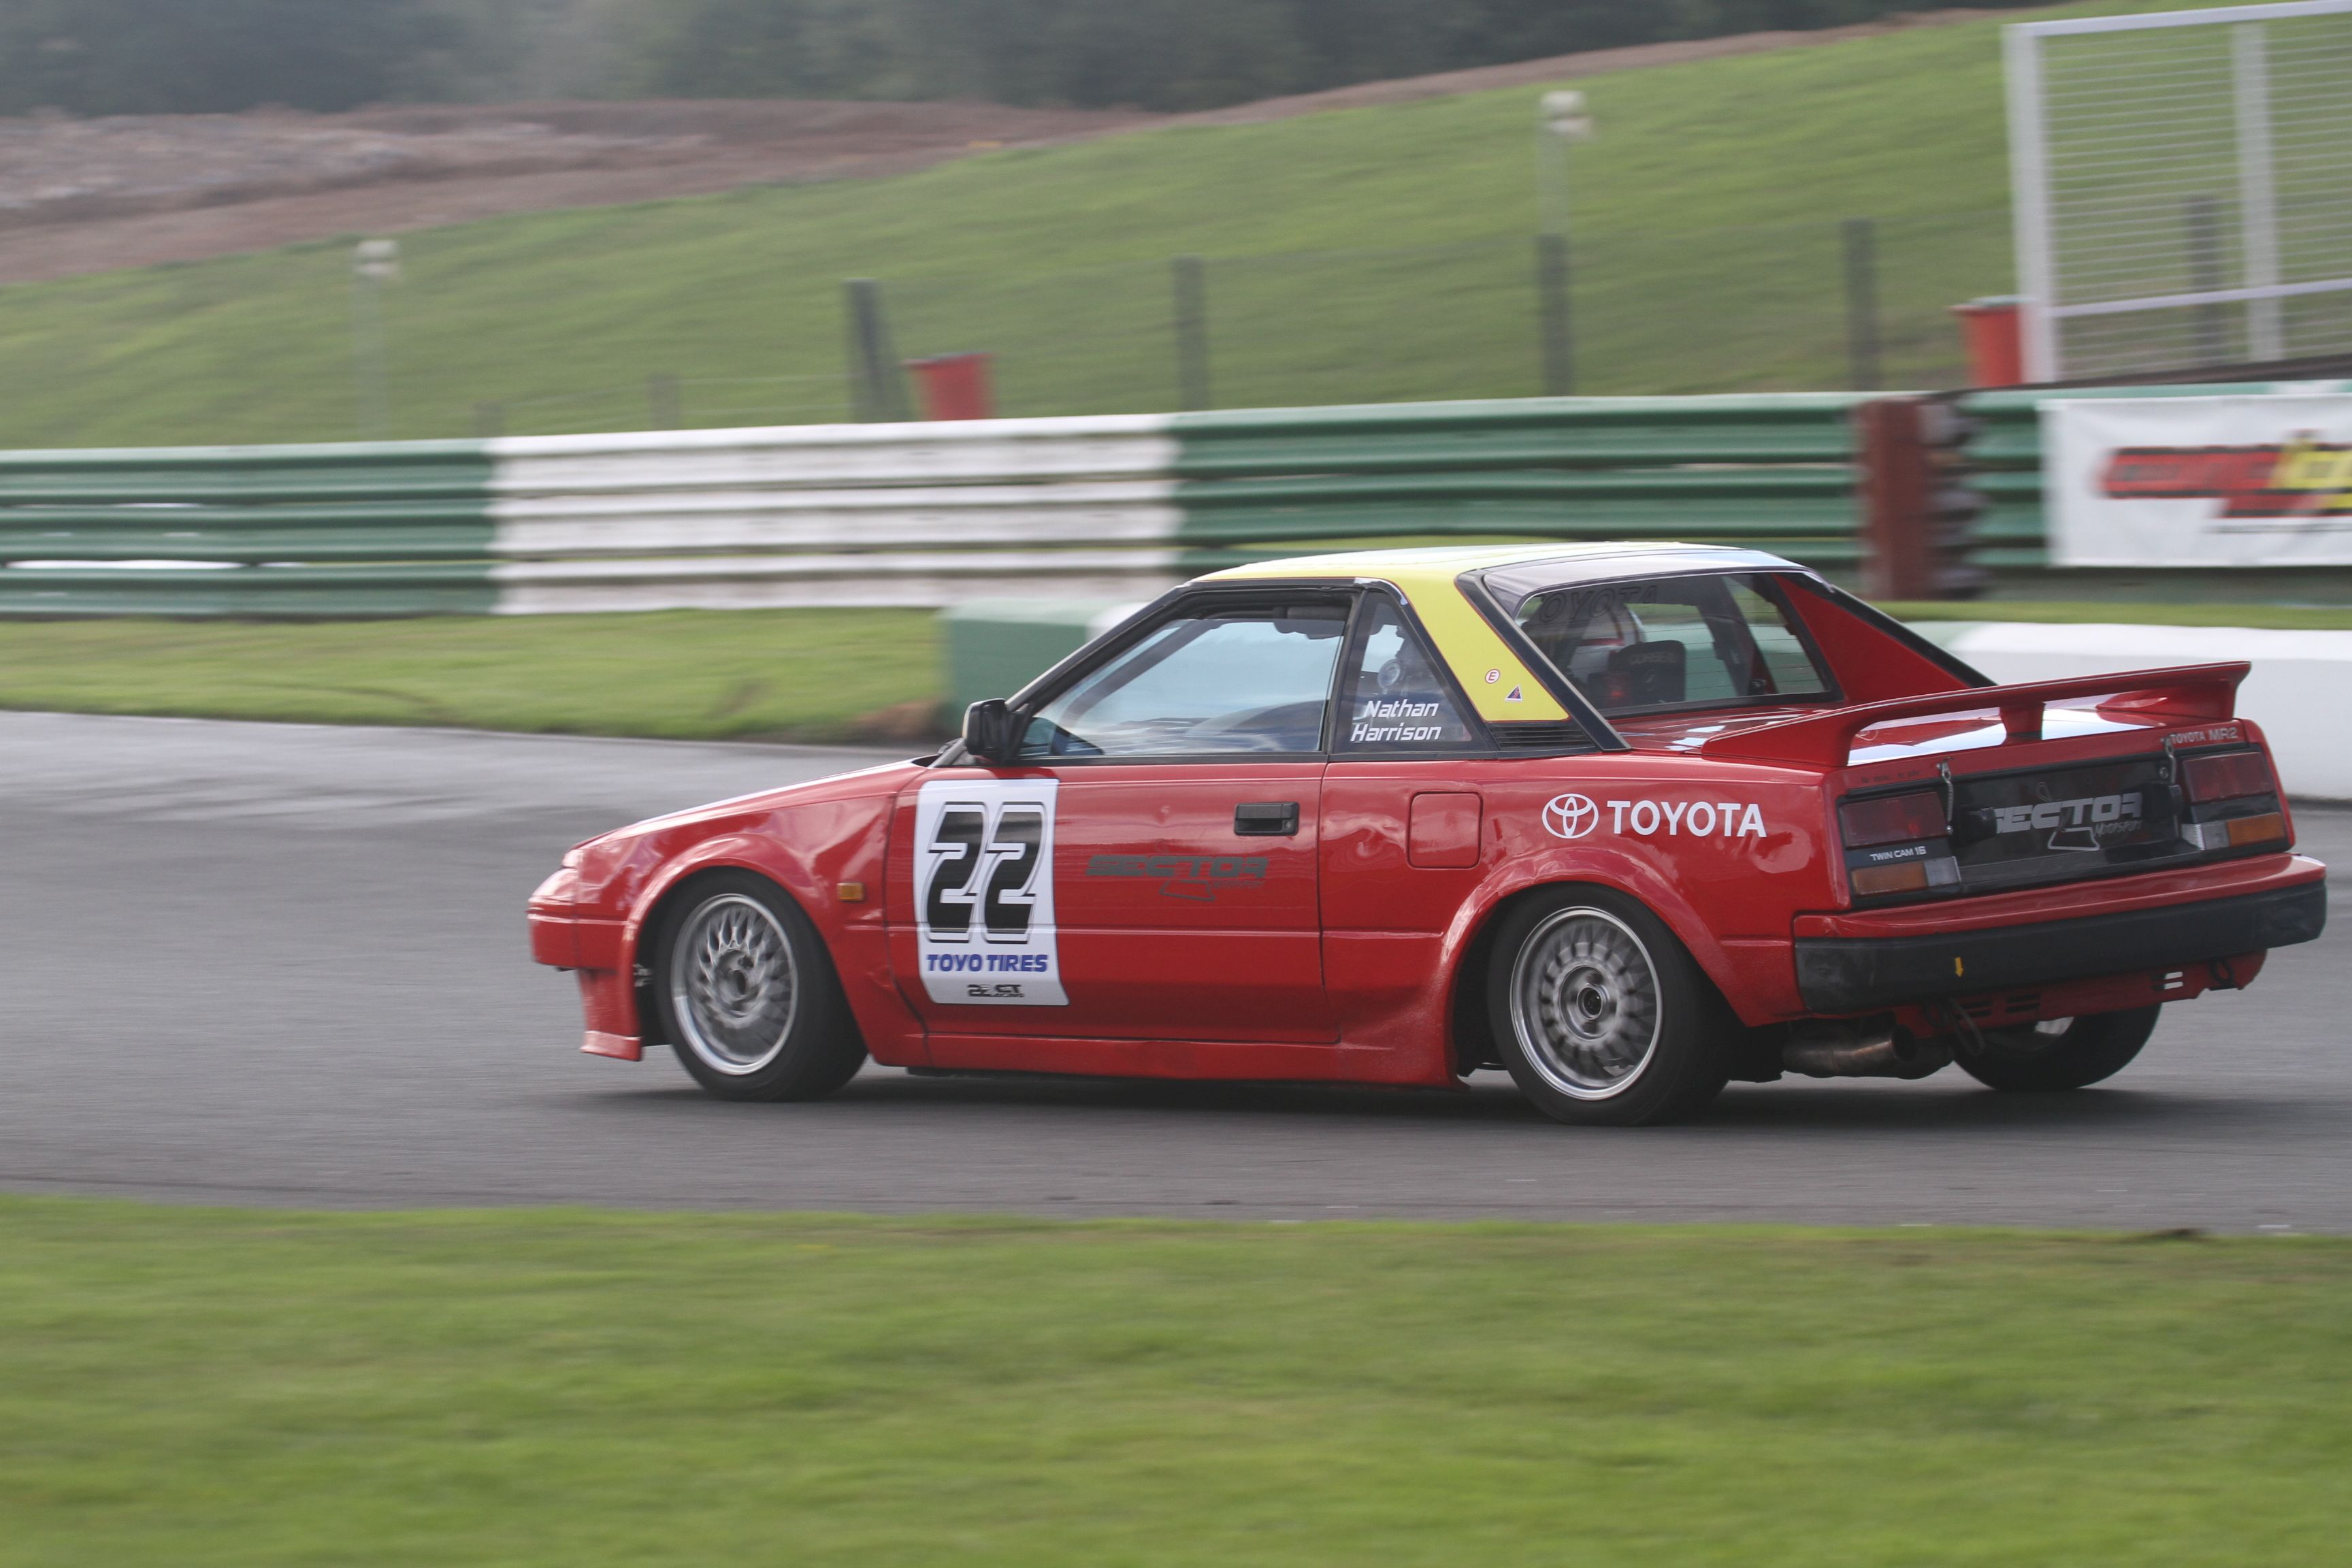 2013 Mallory MR2 Race 2 107_zpshrxrq05b